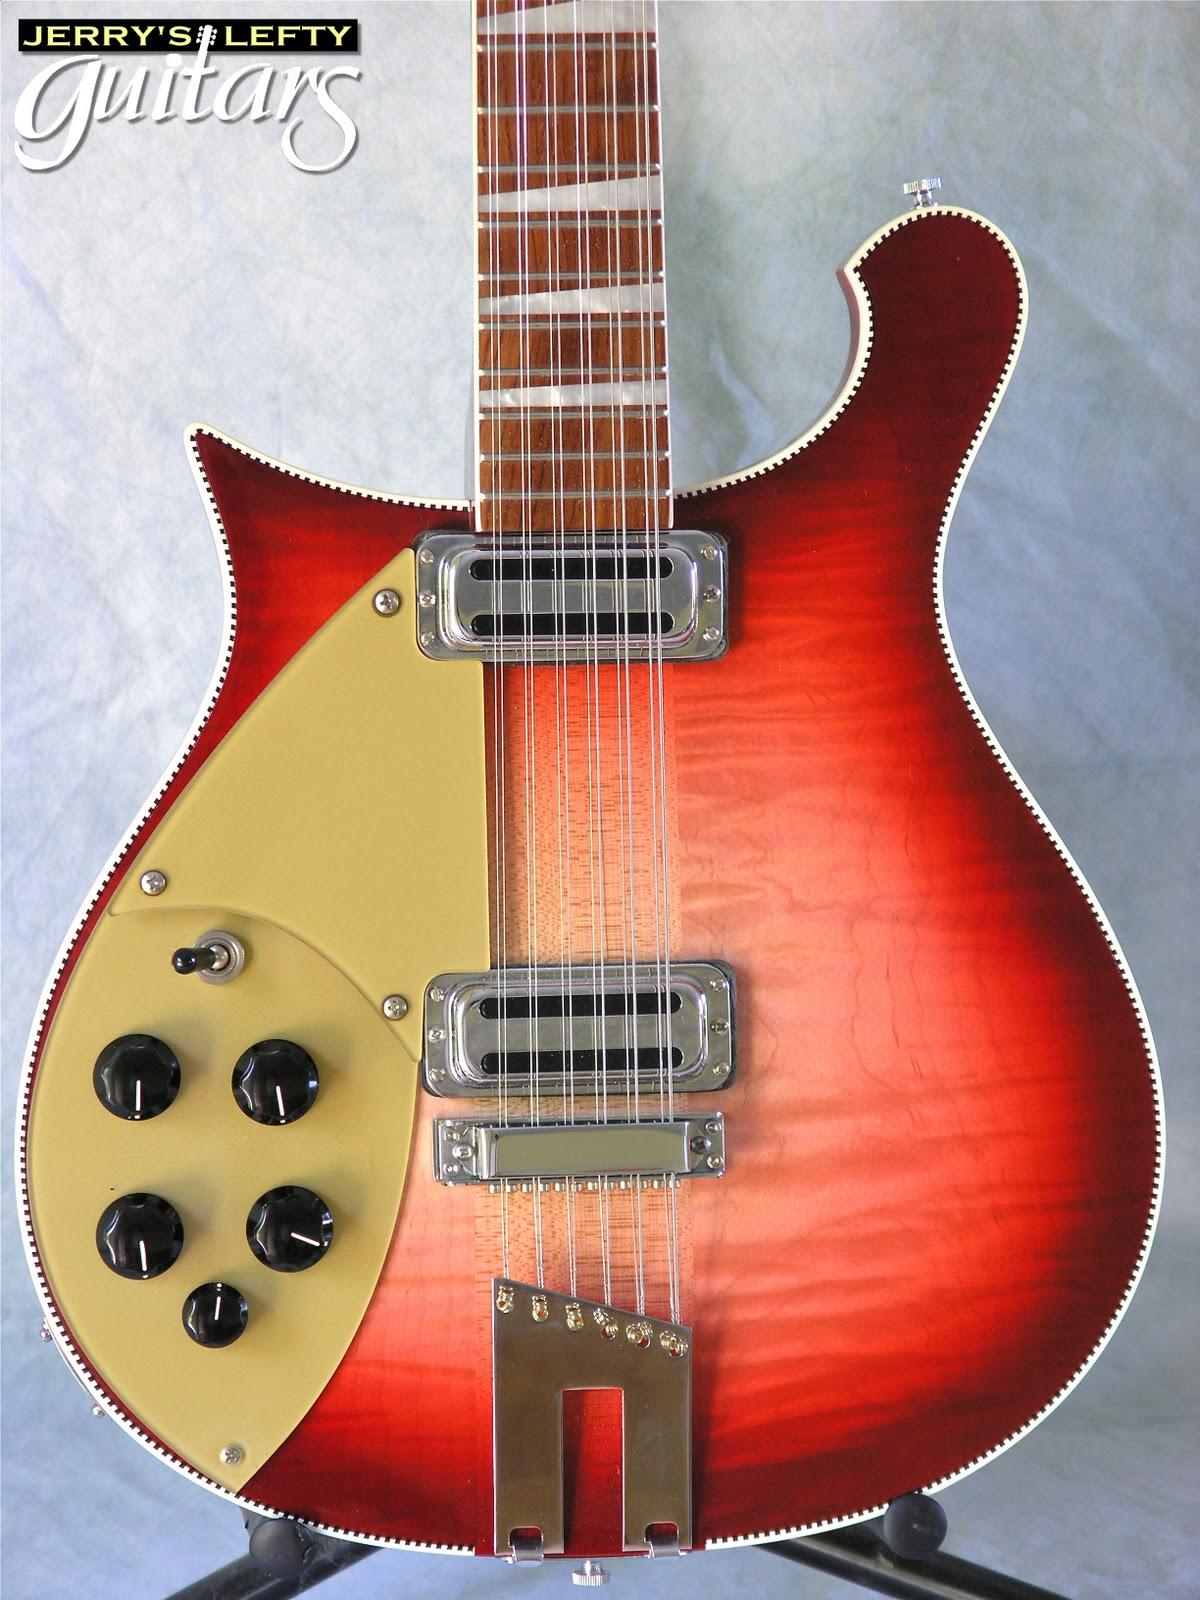 jerry 39 s lefty guitars newest guitar arrivals updated weekly rickenbacker 660 12 fireglow left. Black Bedroom Furniture Sets. Home Design Ideas